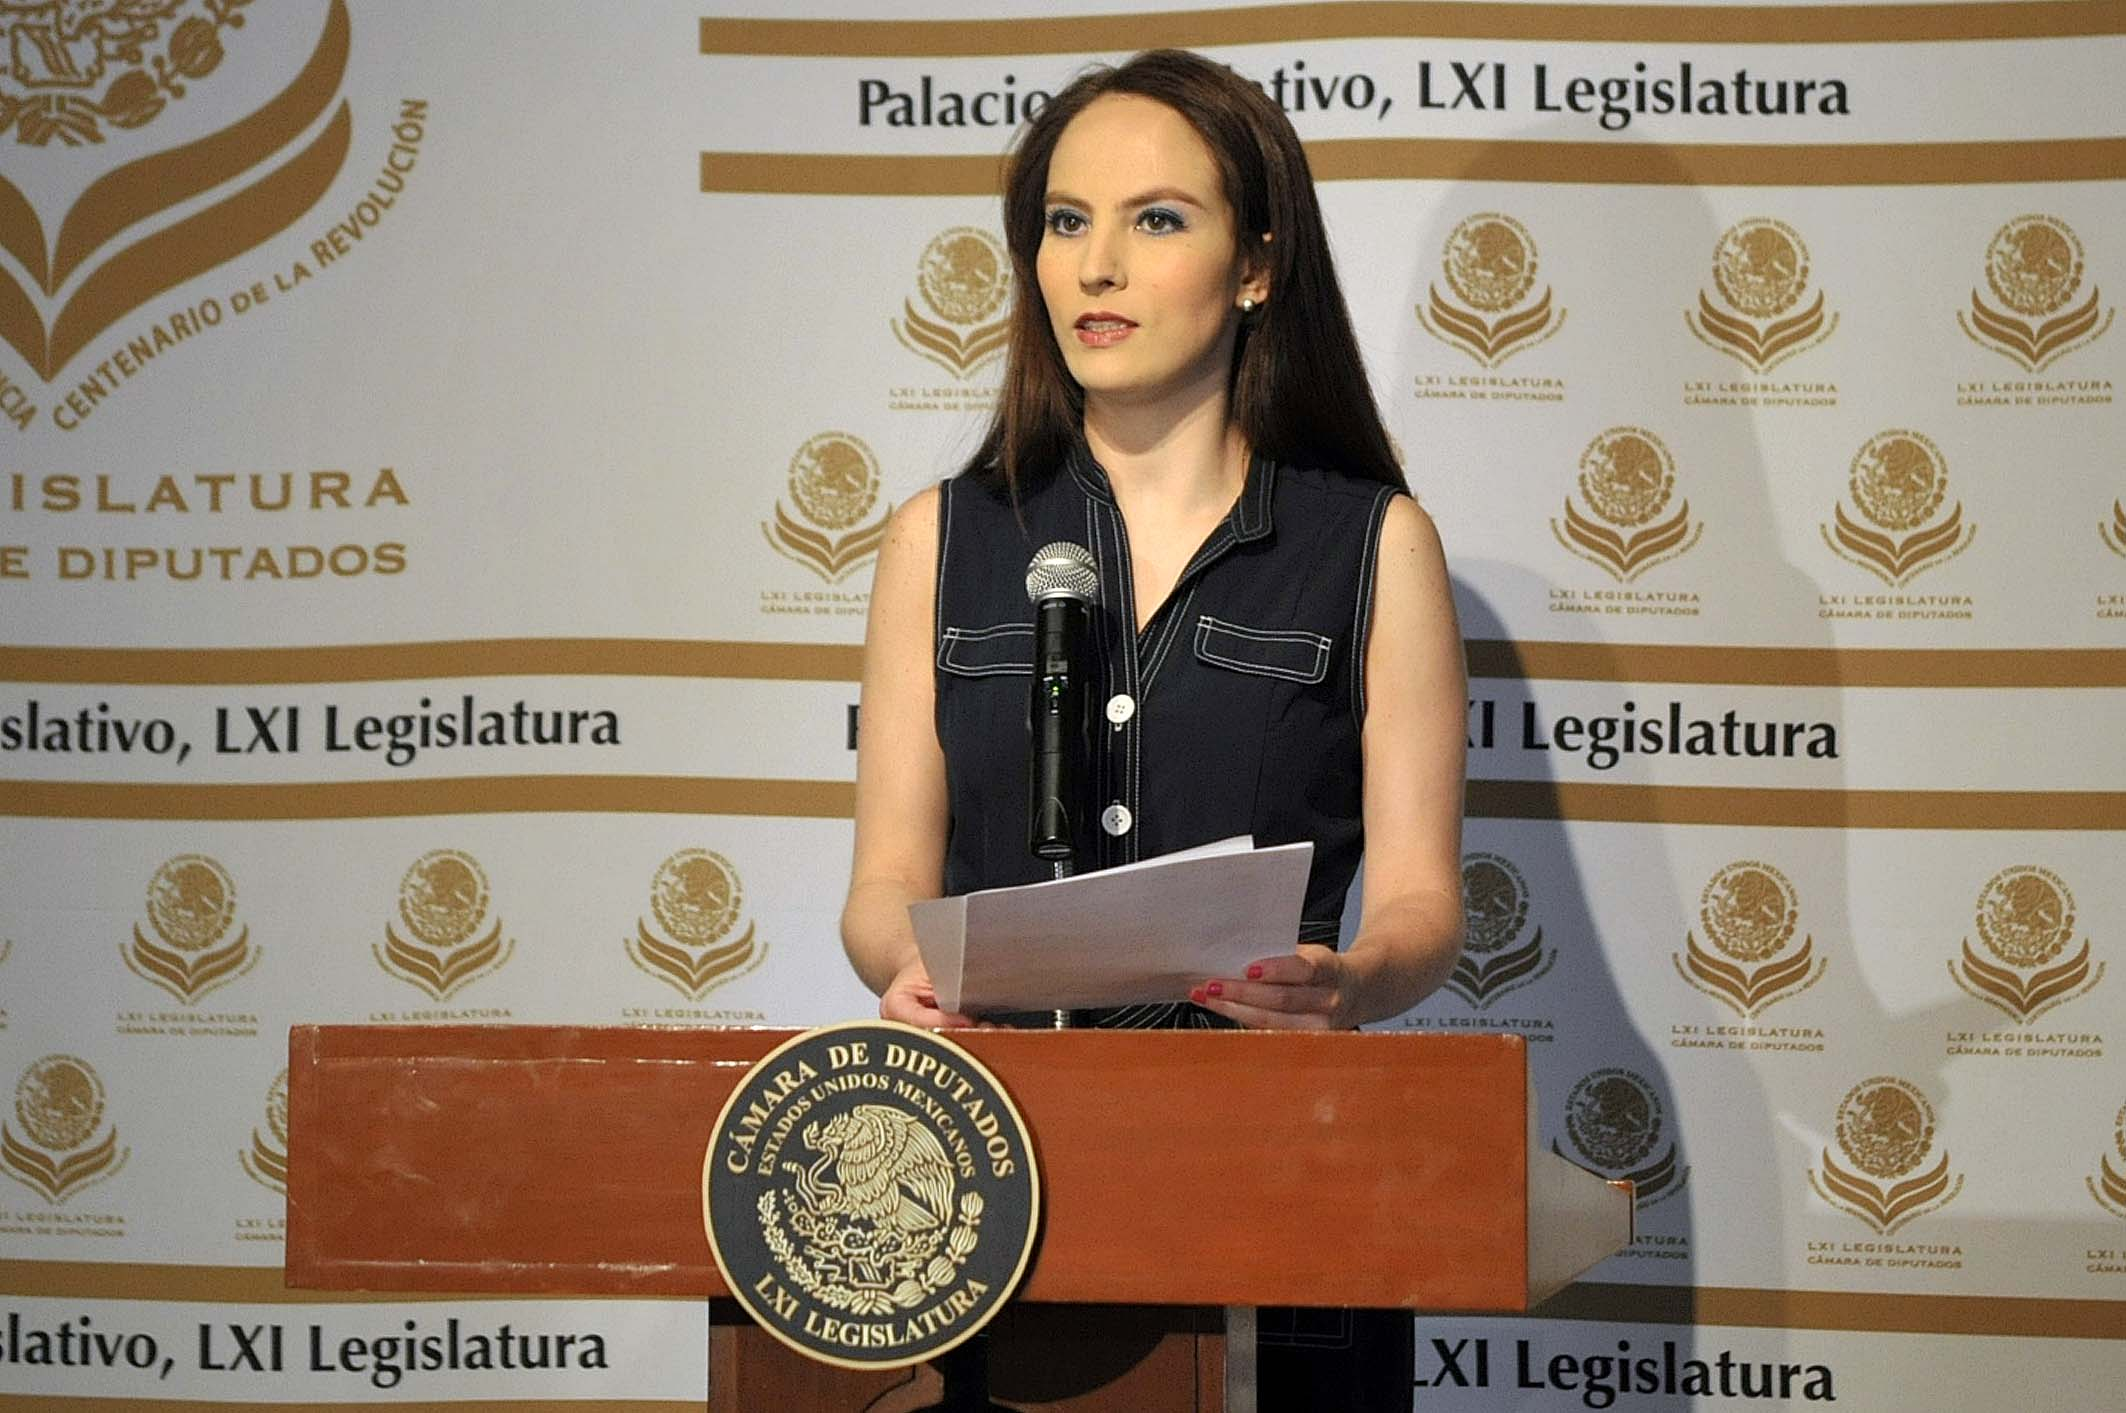 Gabriela Cuevas Barron